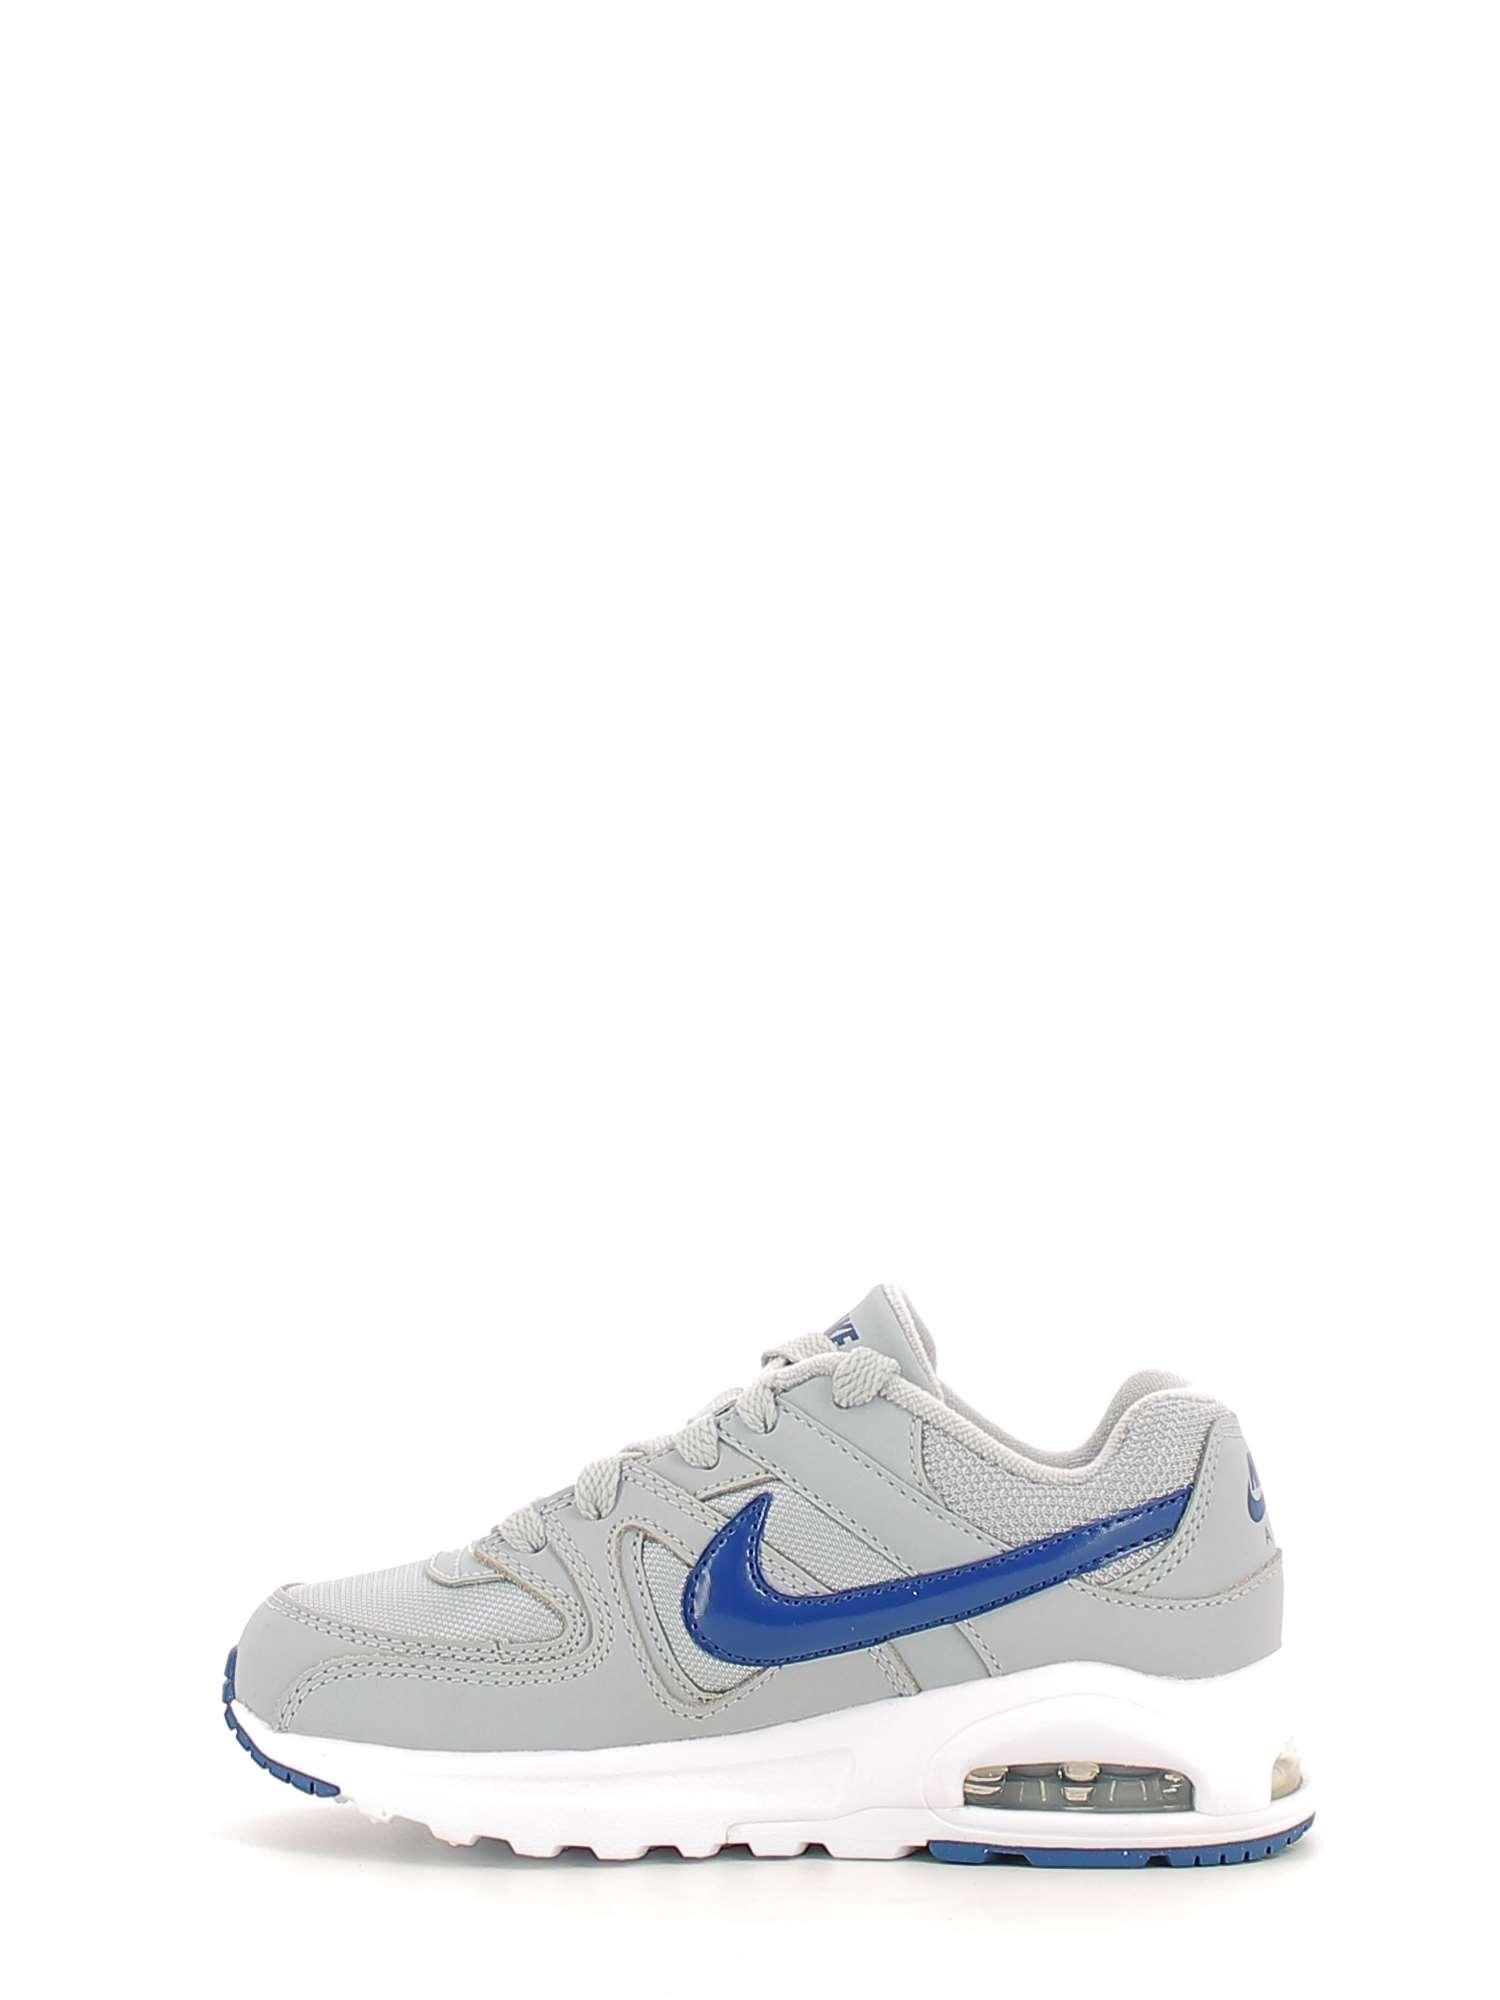 huge selection of f05cf abbed Scarpe Bimbo Nike Air Max Command Flex PS Grigio Blu Art. 844347-041